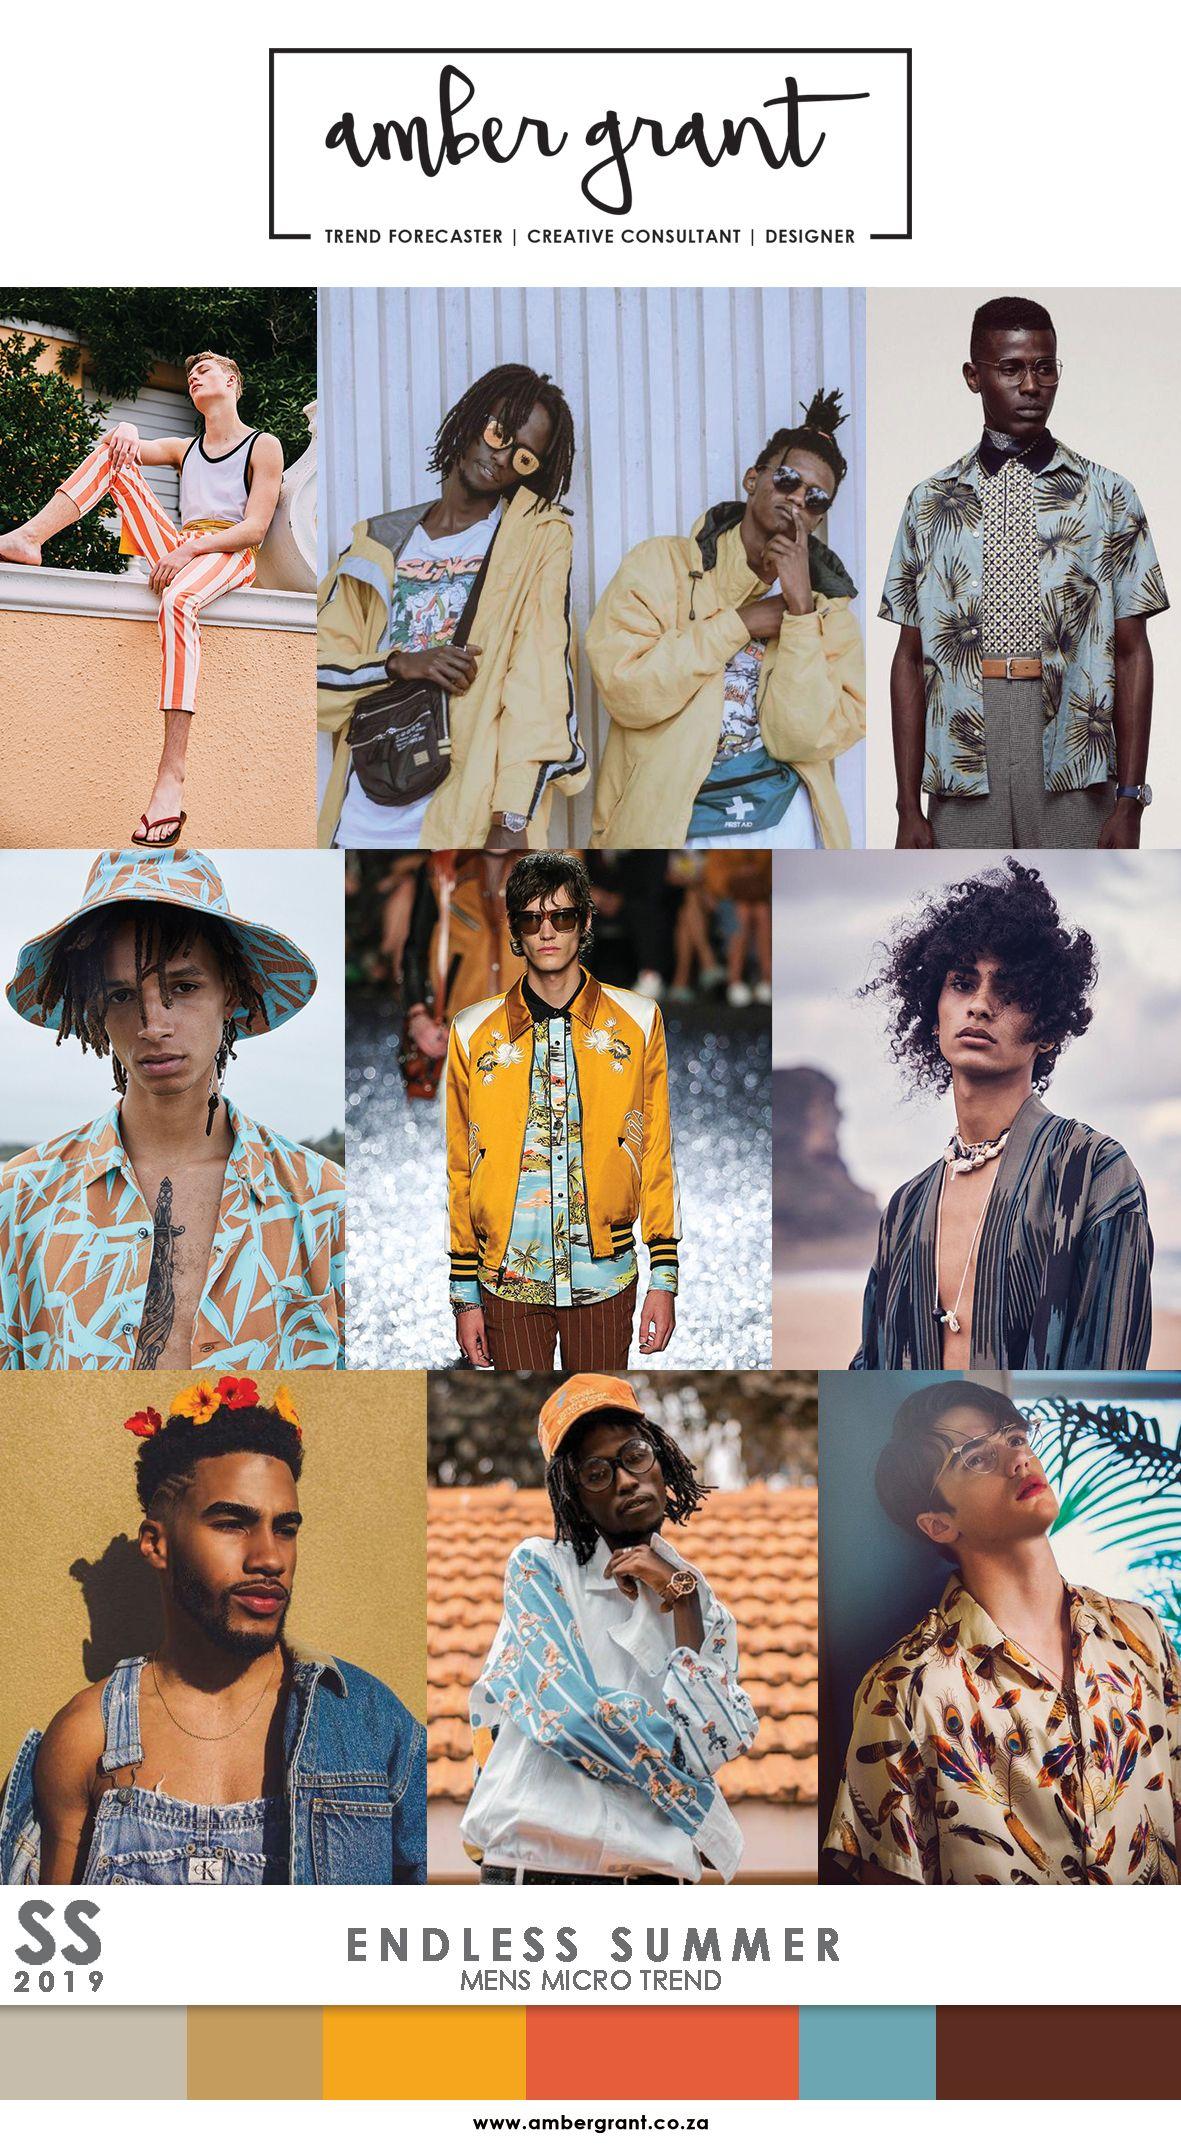 SS19 Mens Micro Trend: Endless Summer www.ambergrant.co.za ...